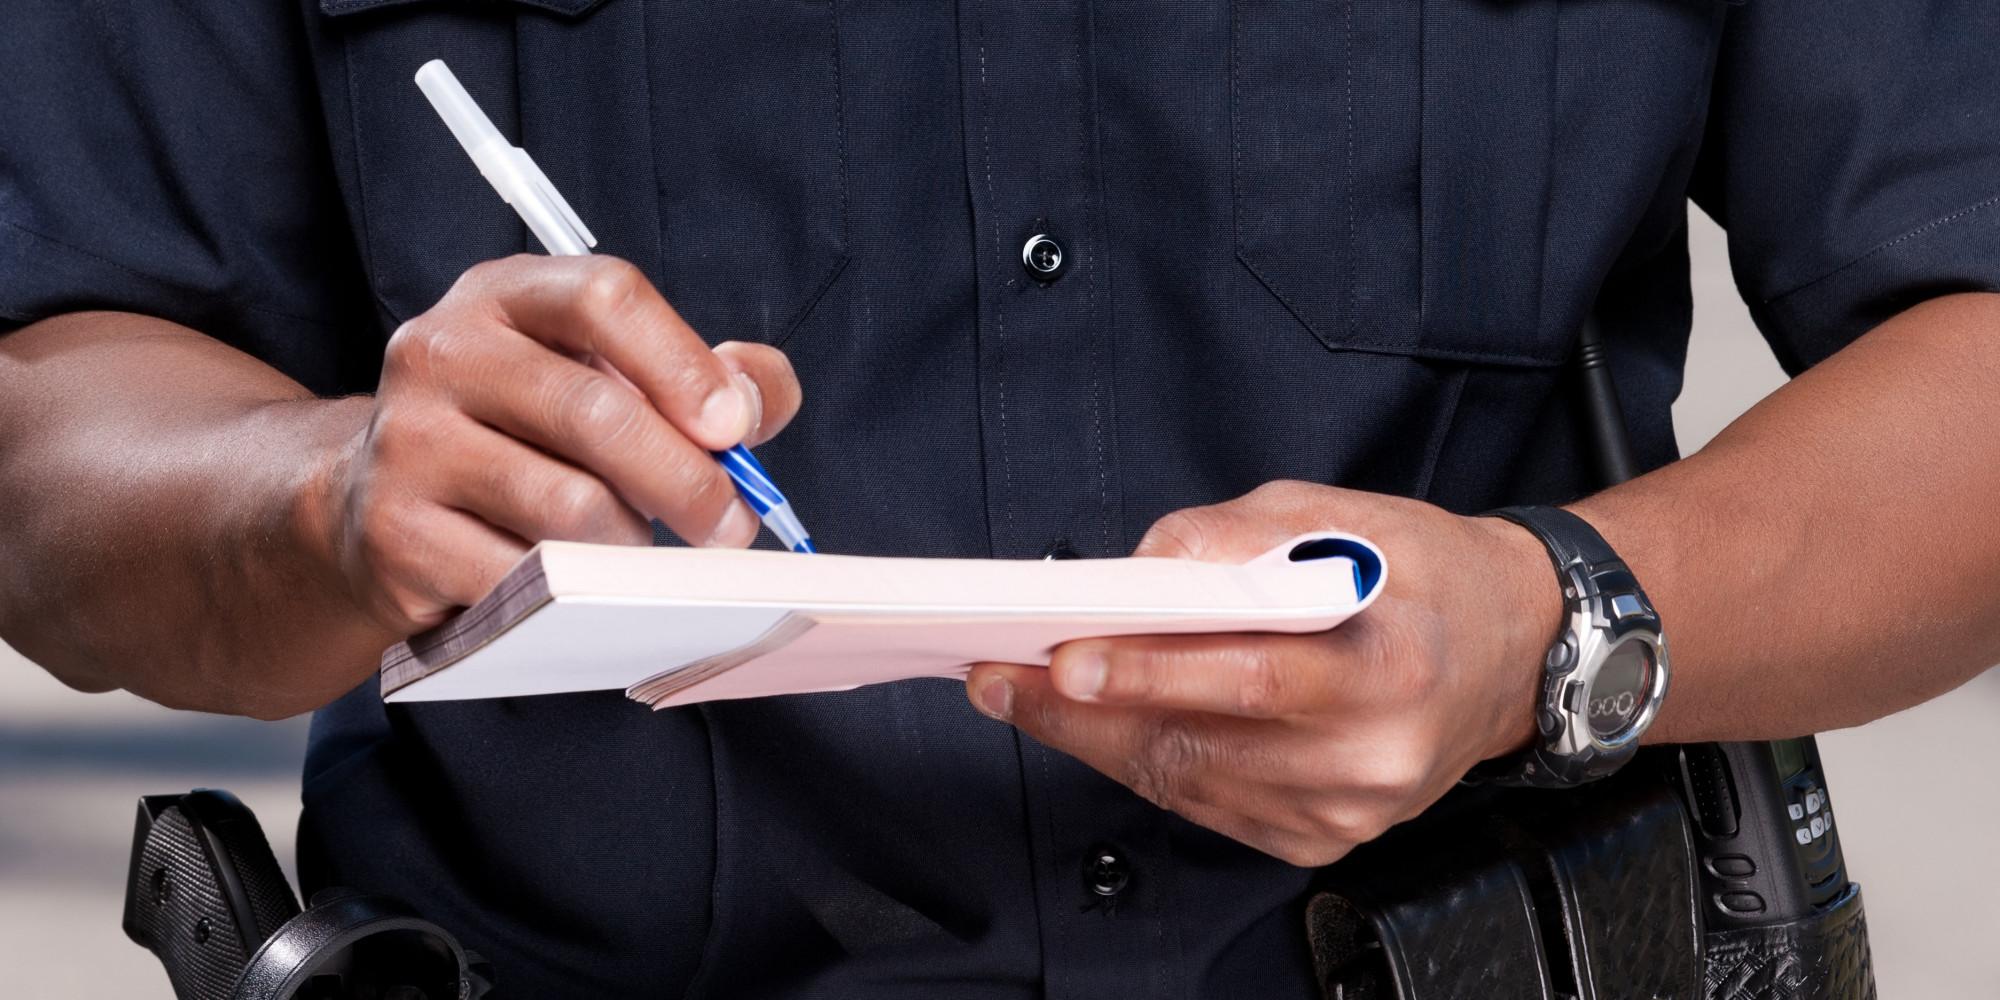 Do police really write tickets to make money?